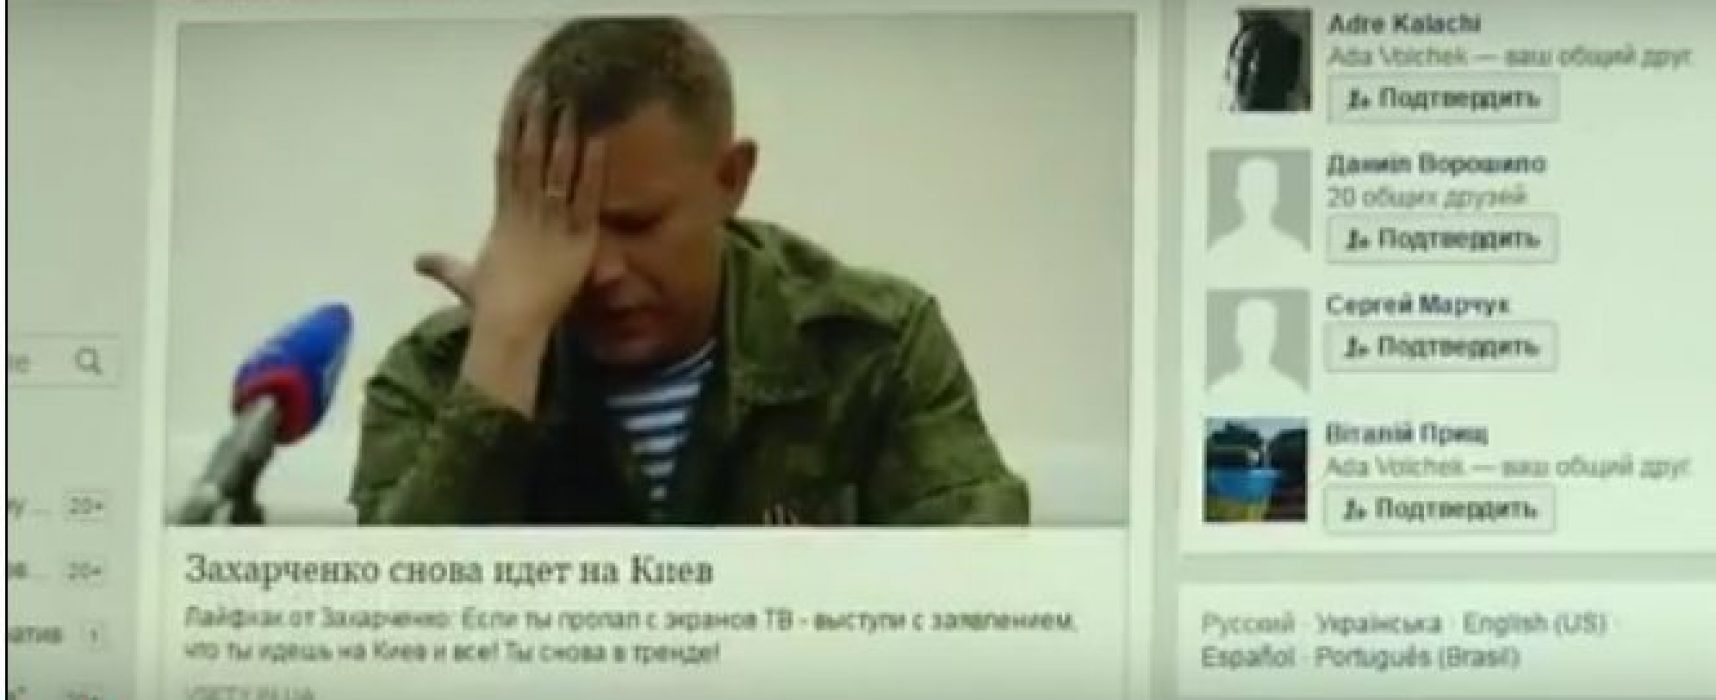 Kremlin trolls exposed: Russia's information war against Ukraine